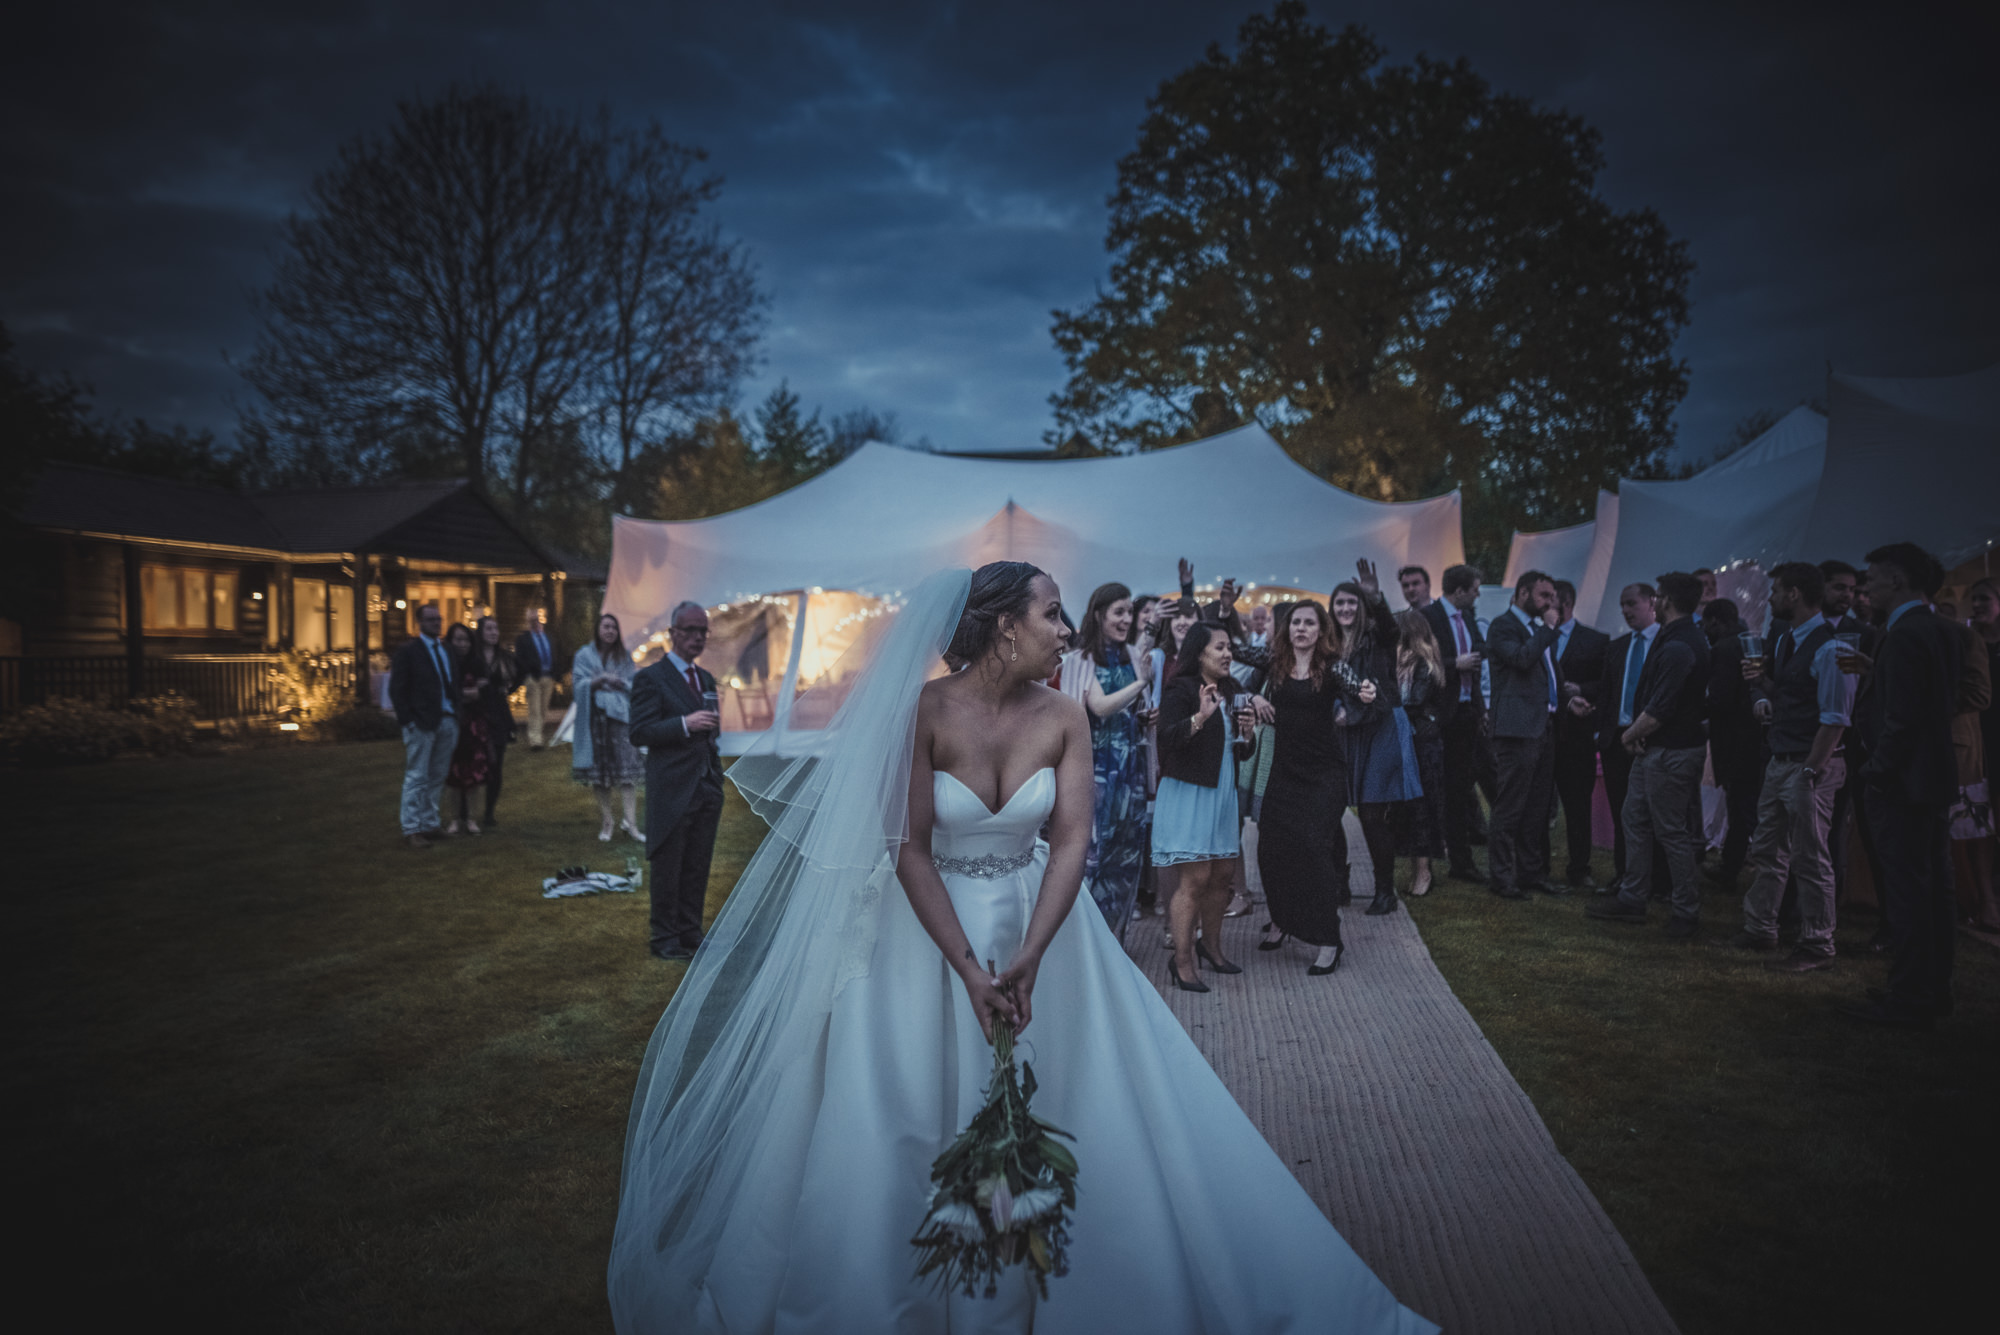 Jacqueline-Gareth-Wedding-Westmead-Events-Surrey-Manu-Mendoza-Wedding-Photography-500.jpg